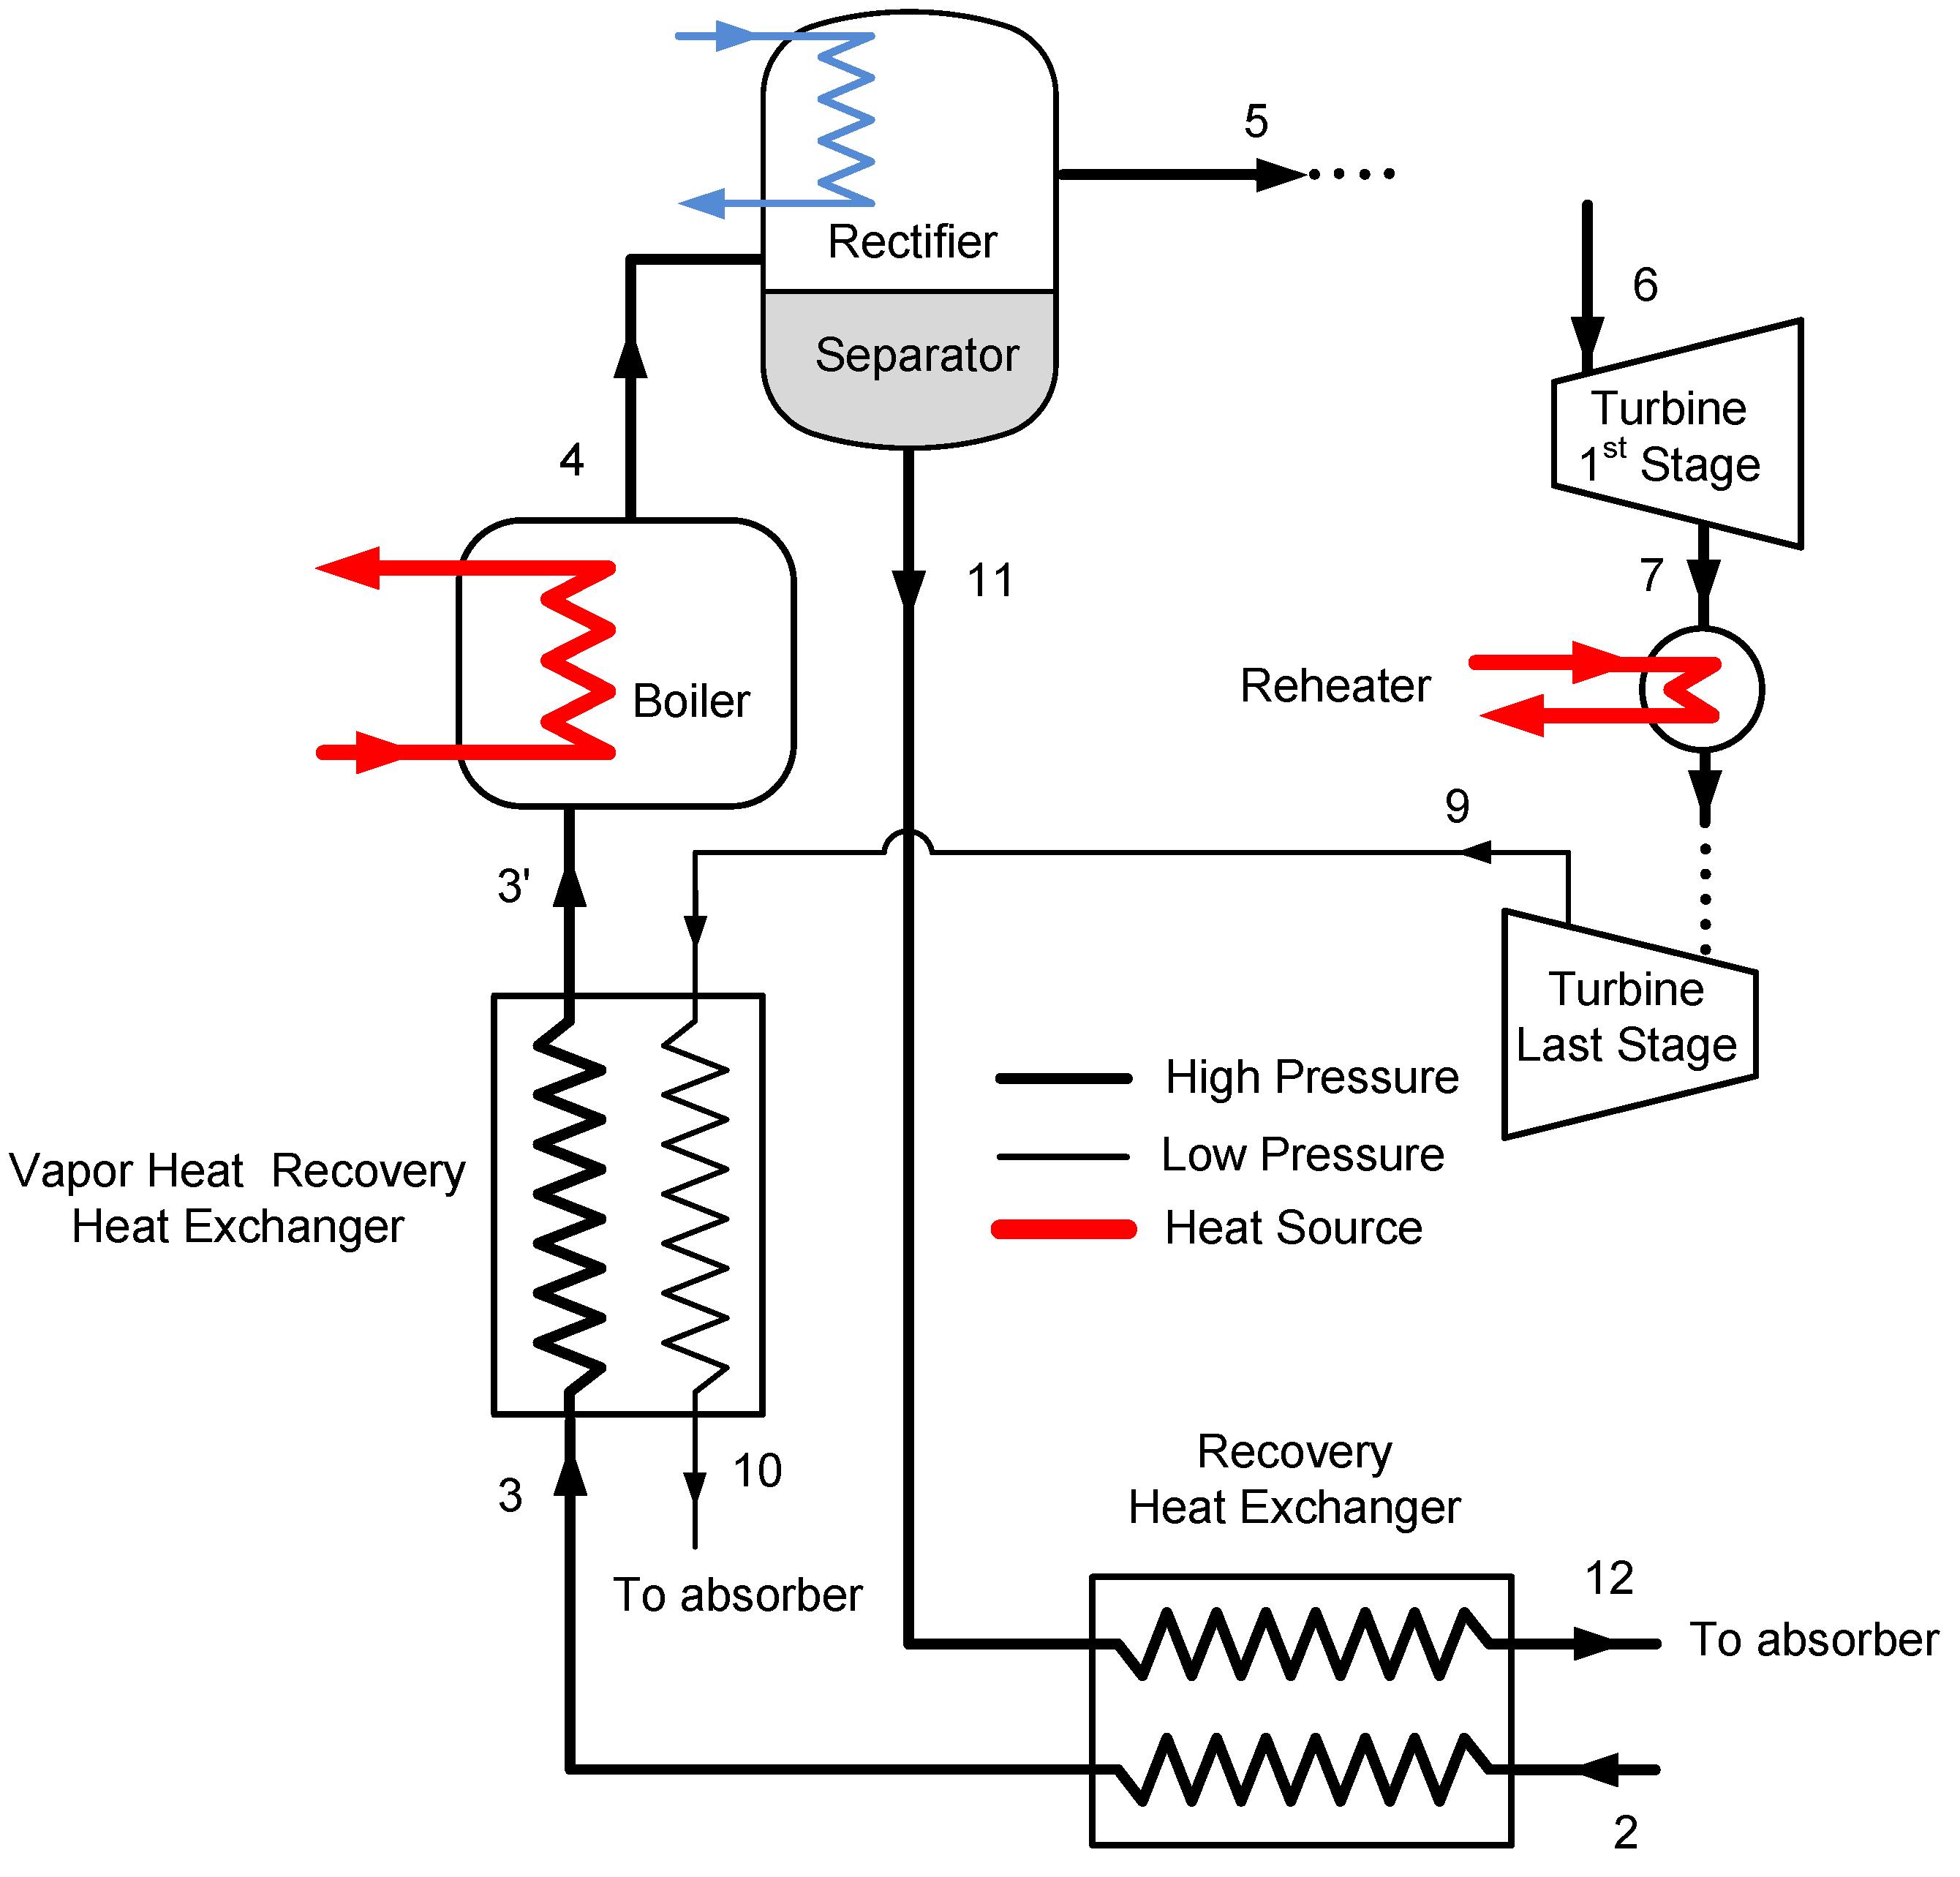 2005 international 7400 wiring diagram